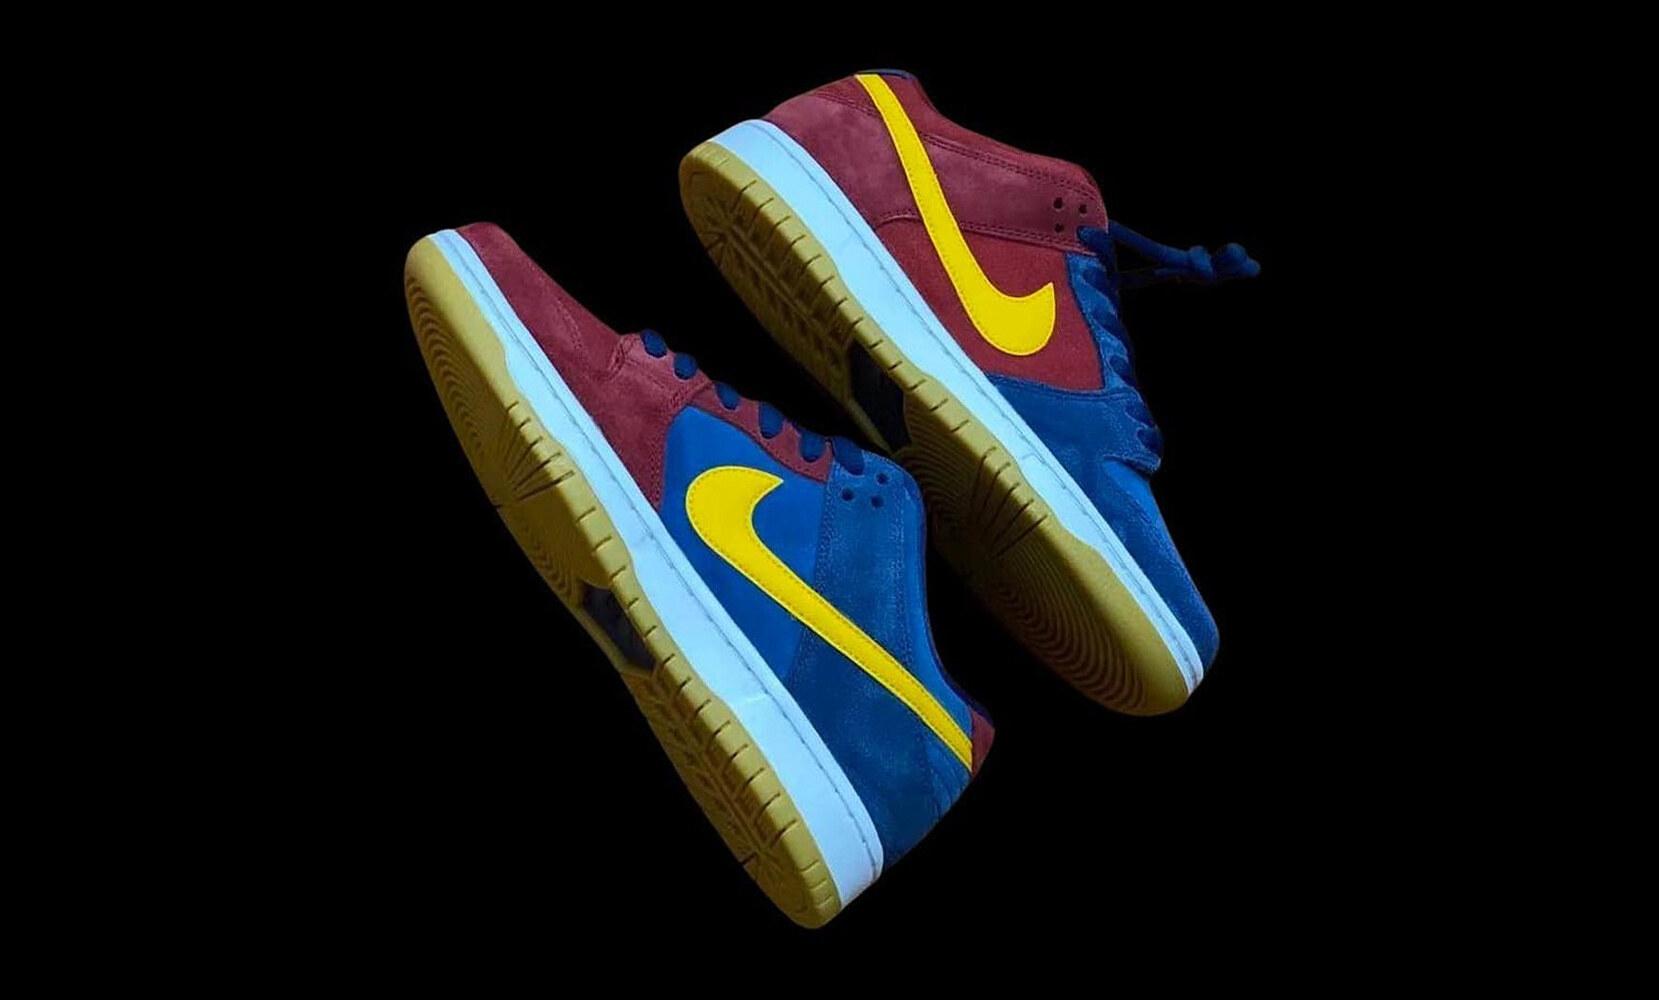 Nike SB Dunk Low Barcellona